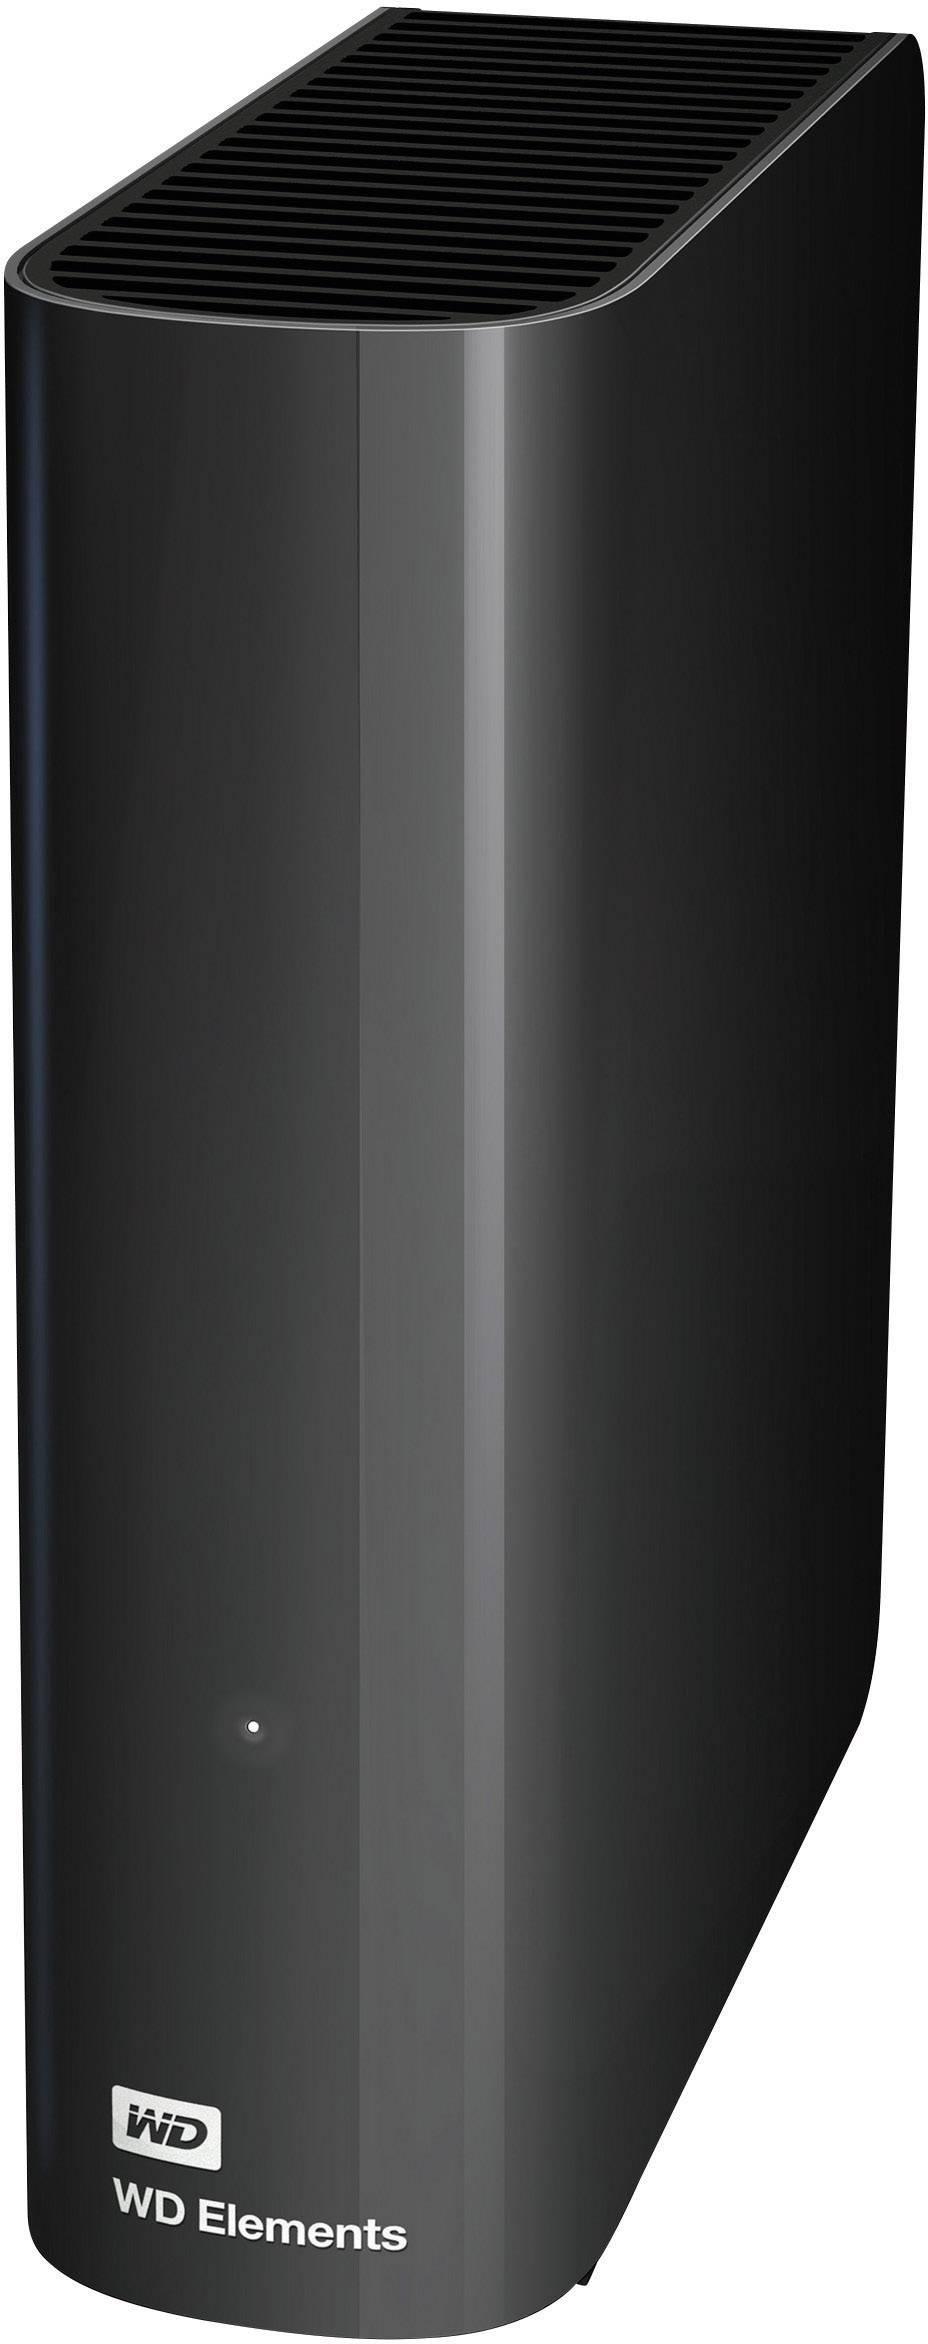 "Externí HDD 8,9 cm (3,5"") Western Digital Elements™, 2 TB, USB 3.0, černá"